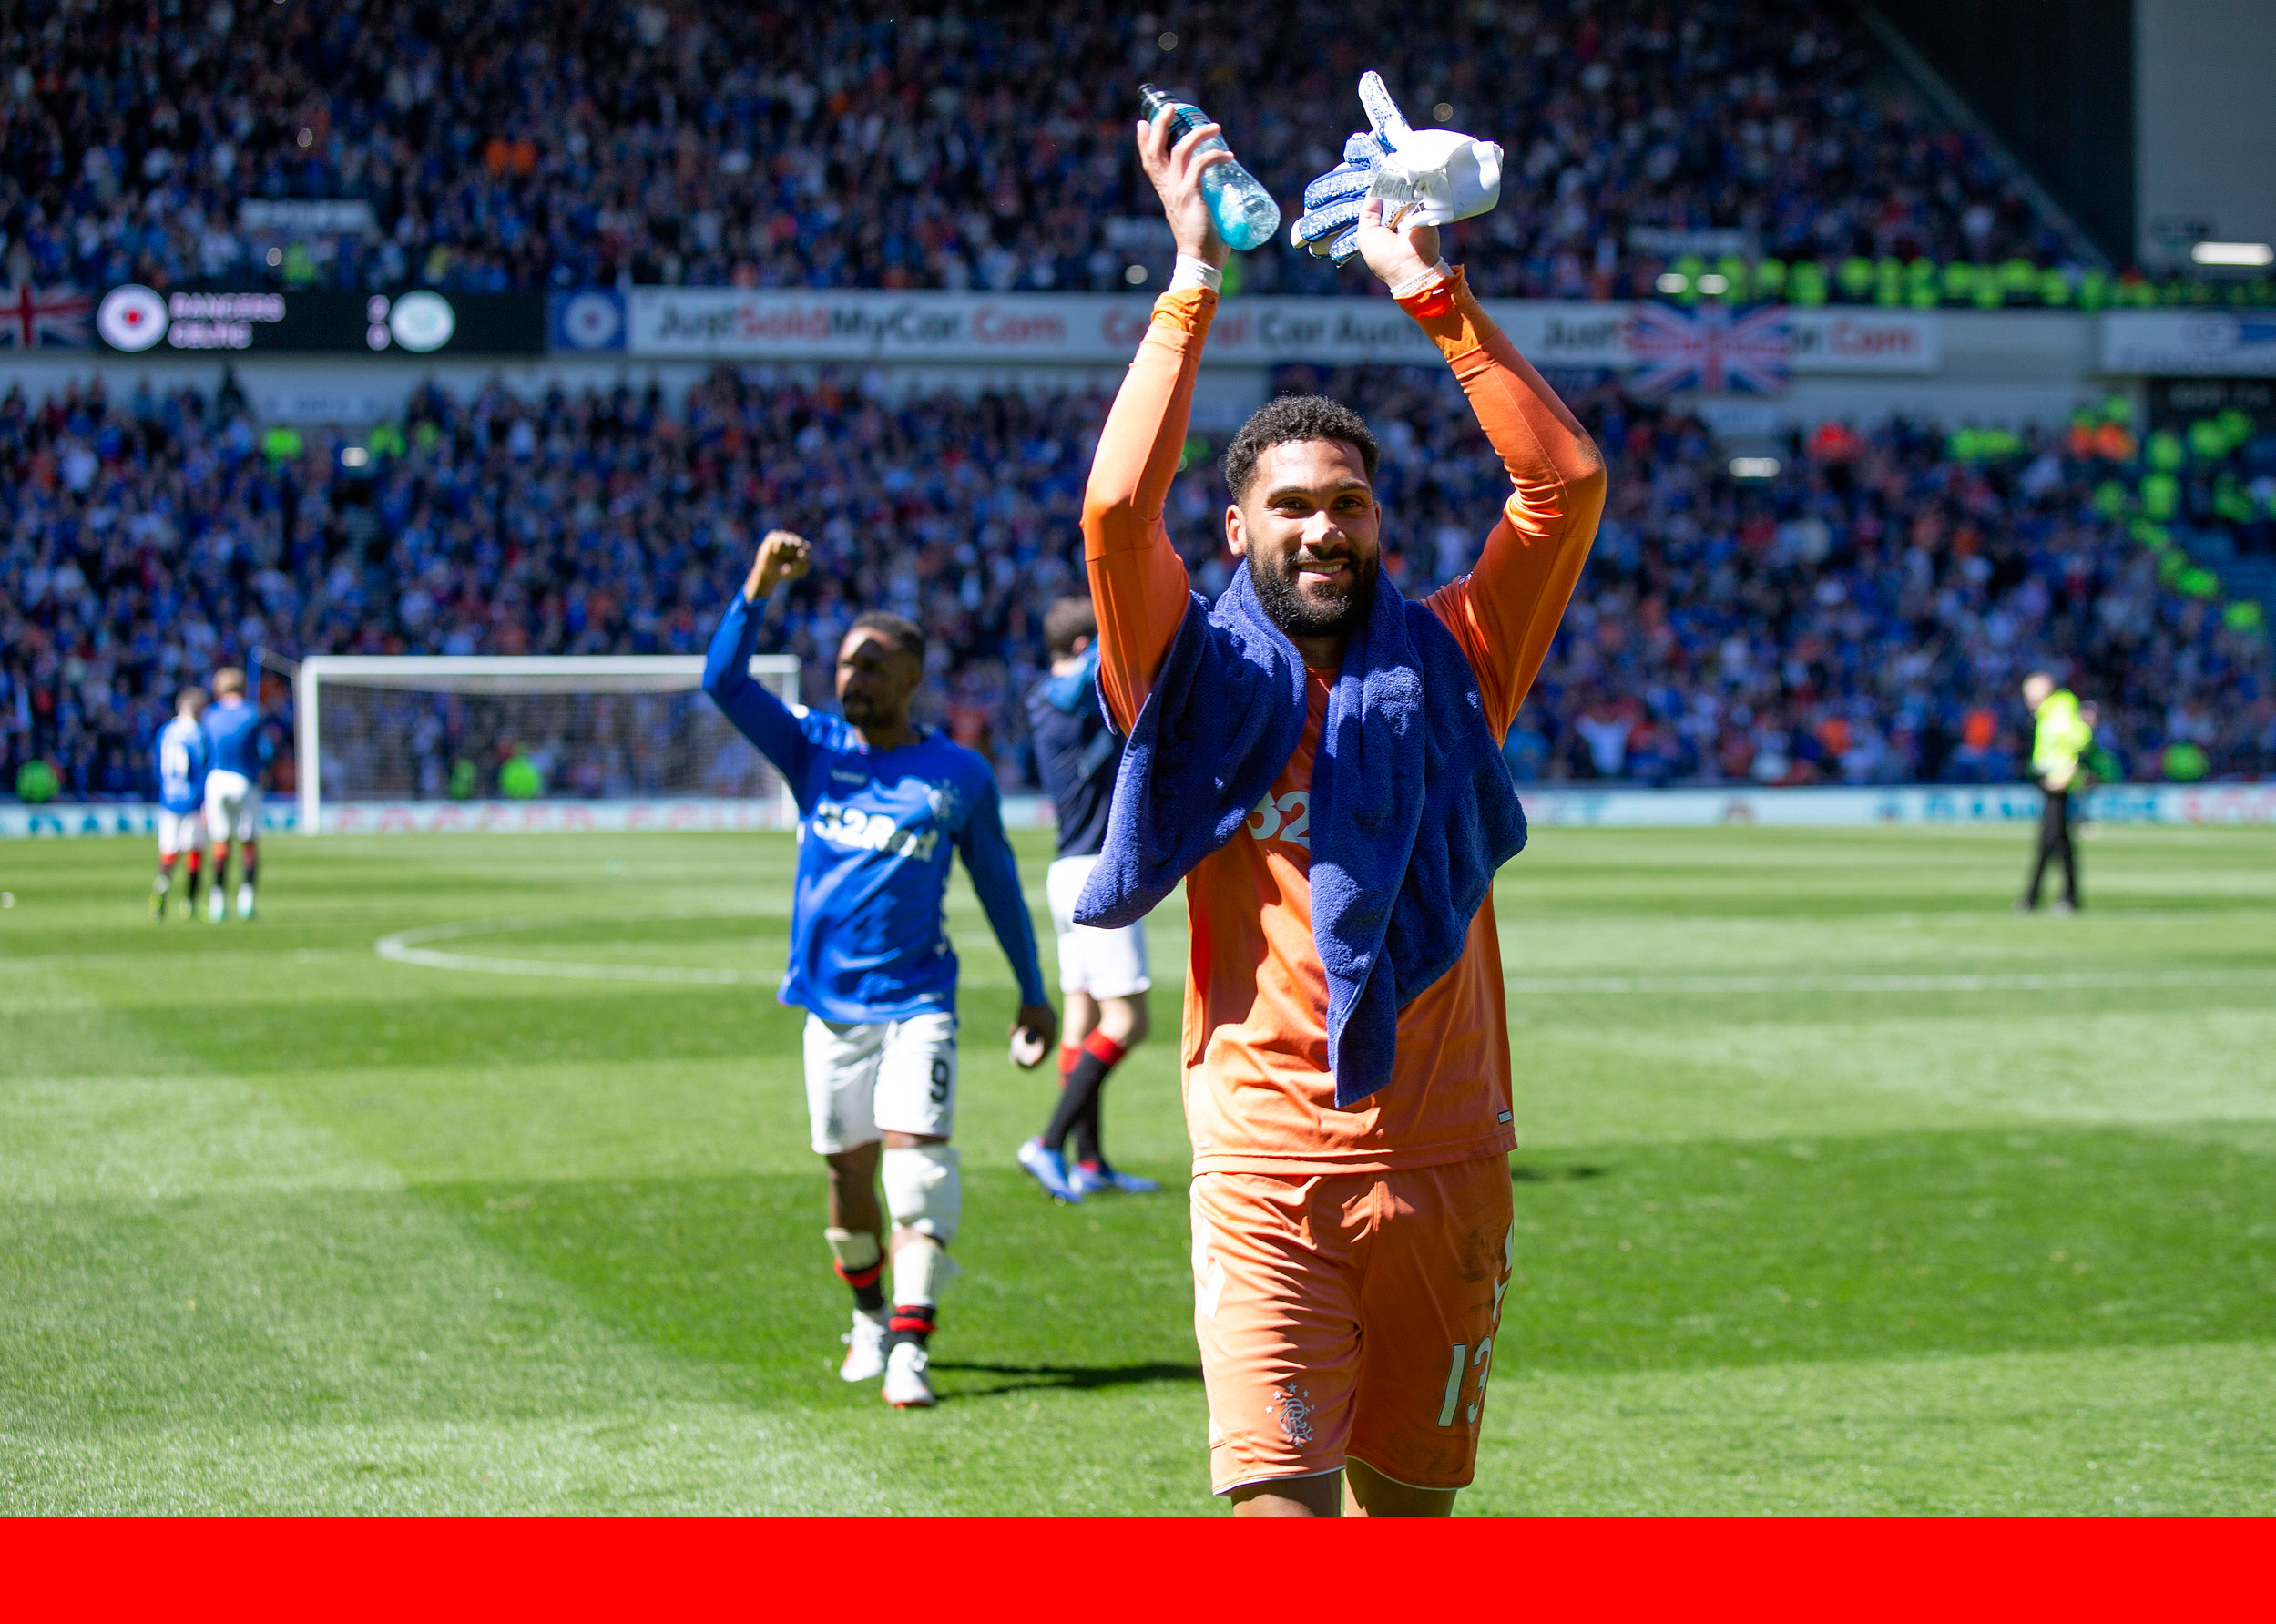 Rangers v Celtic - Scottish Ladbrokes Premiership - Ibrox Stadium